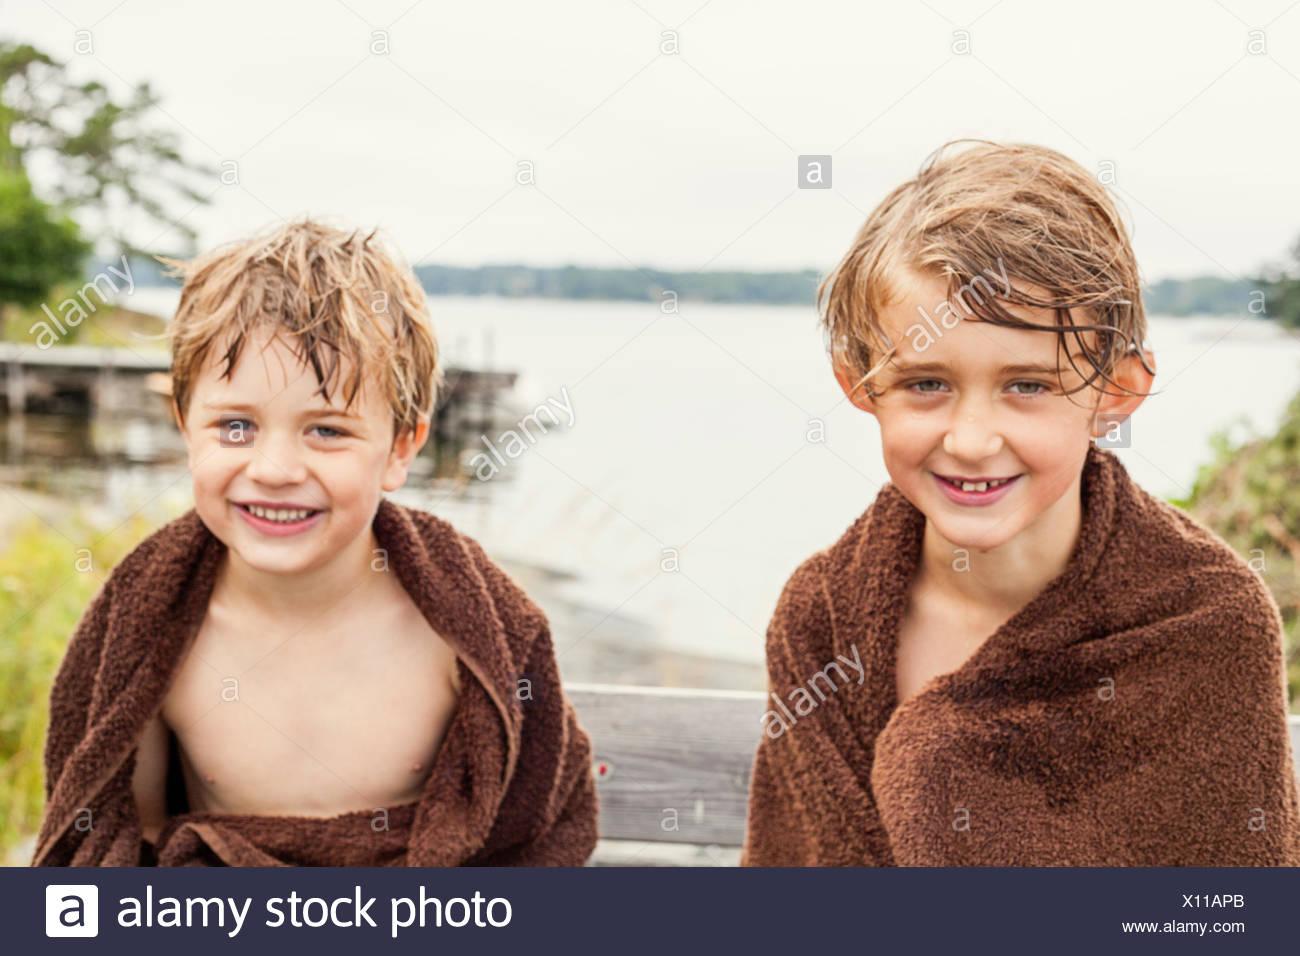 Sweden, Uppland, Runmaro, Barrskar, Portrait of two boys wrapped into towels - Stock Image